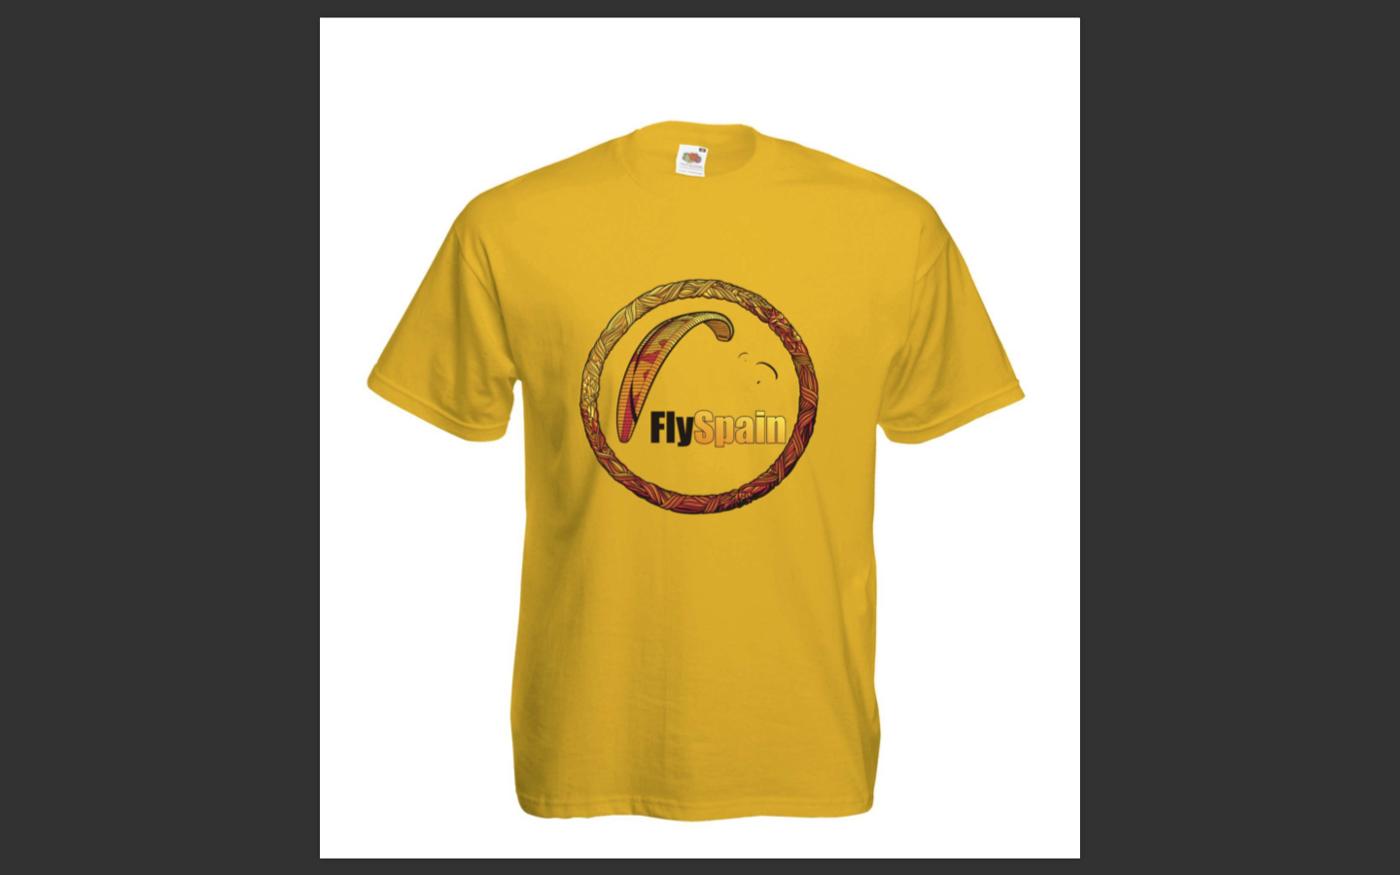 FlySpain Tee